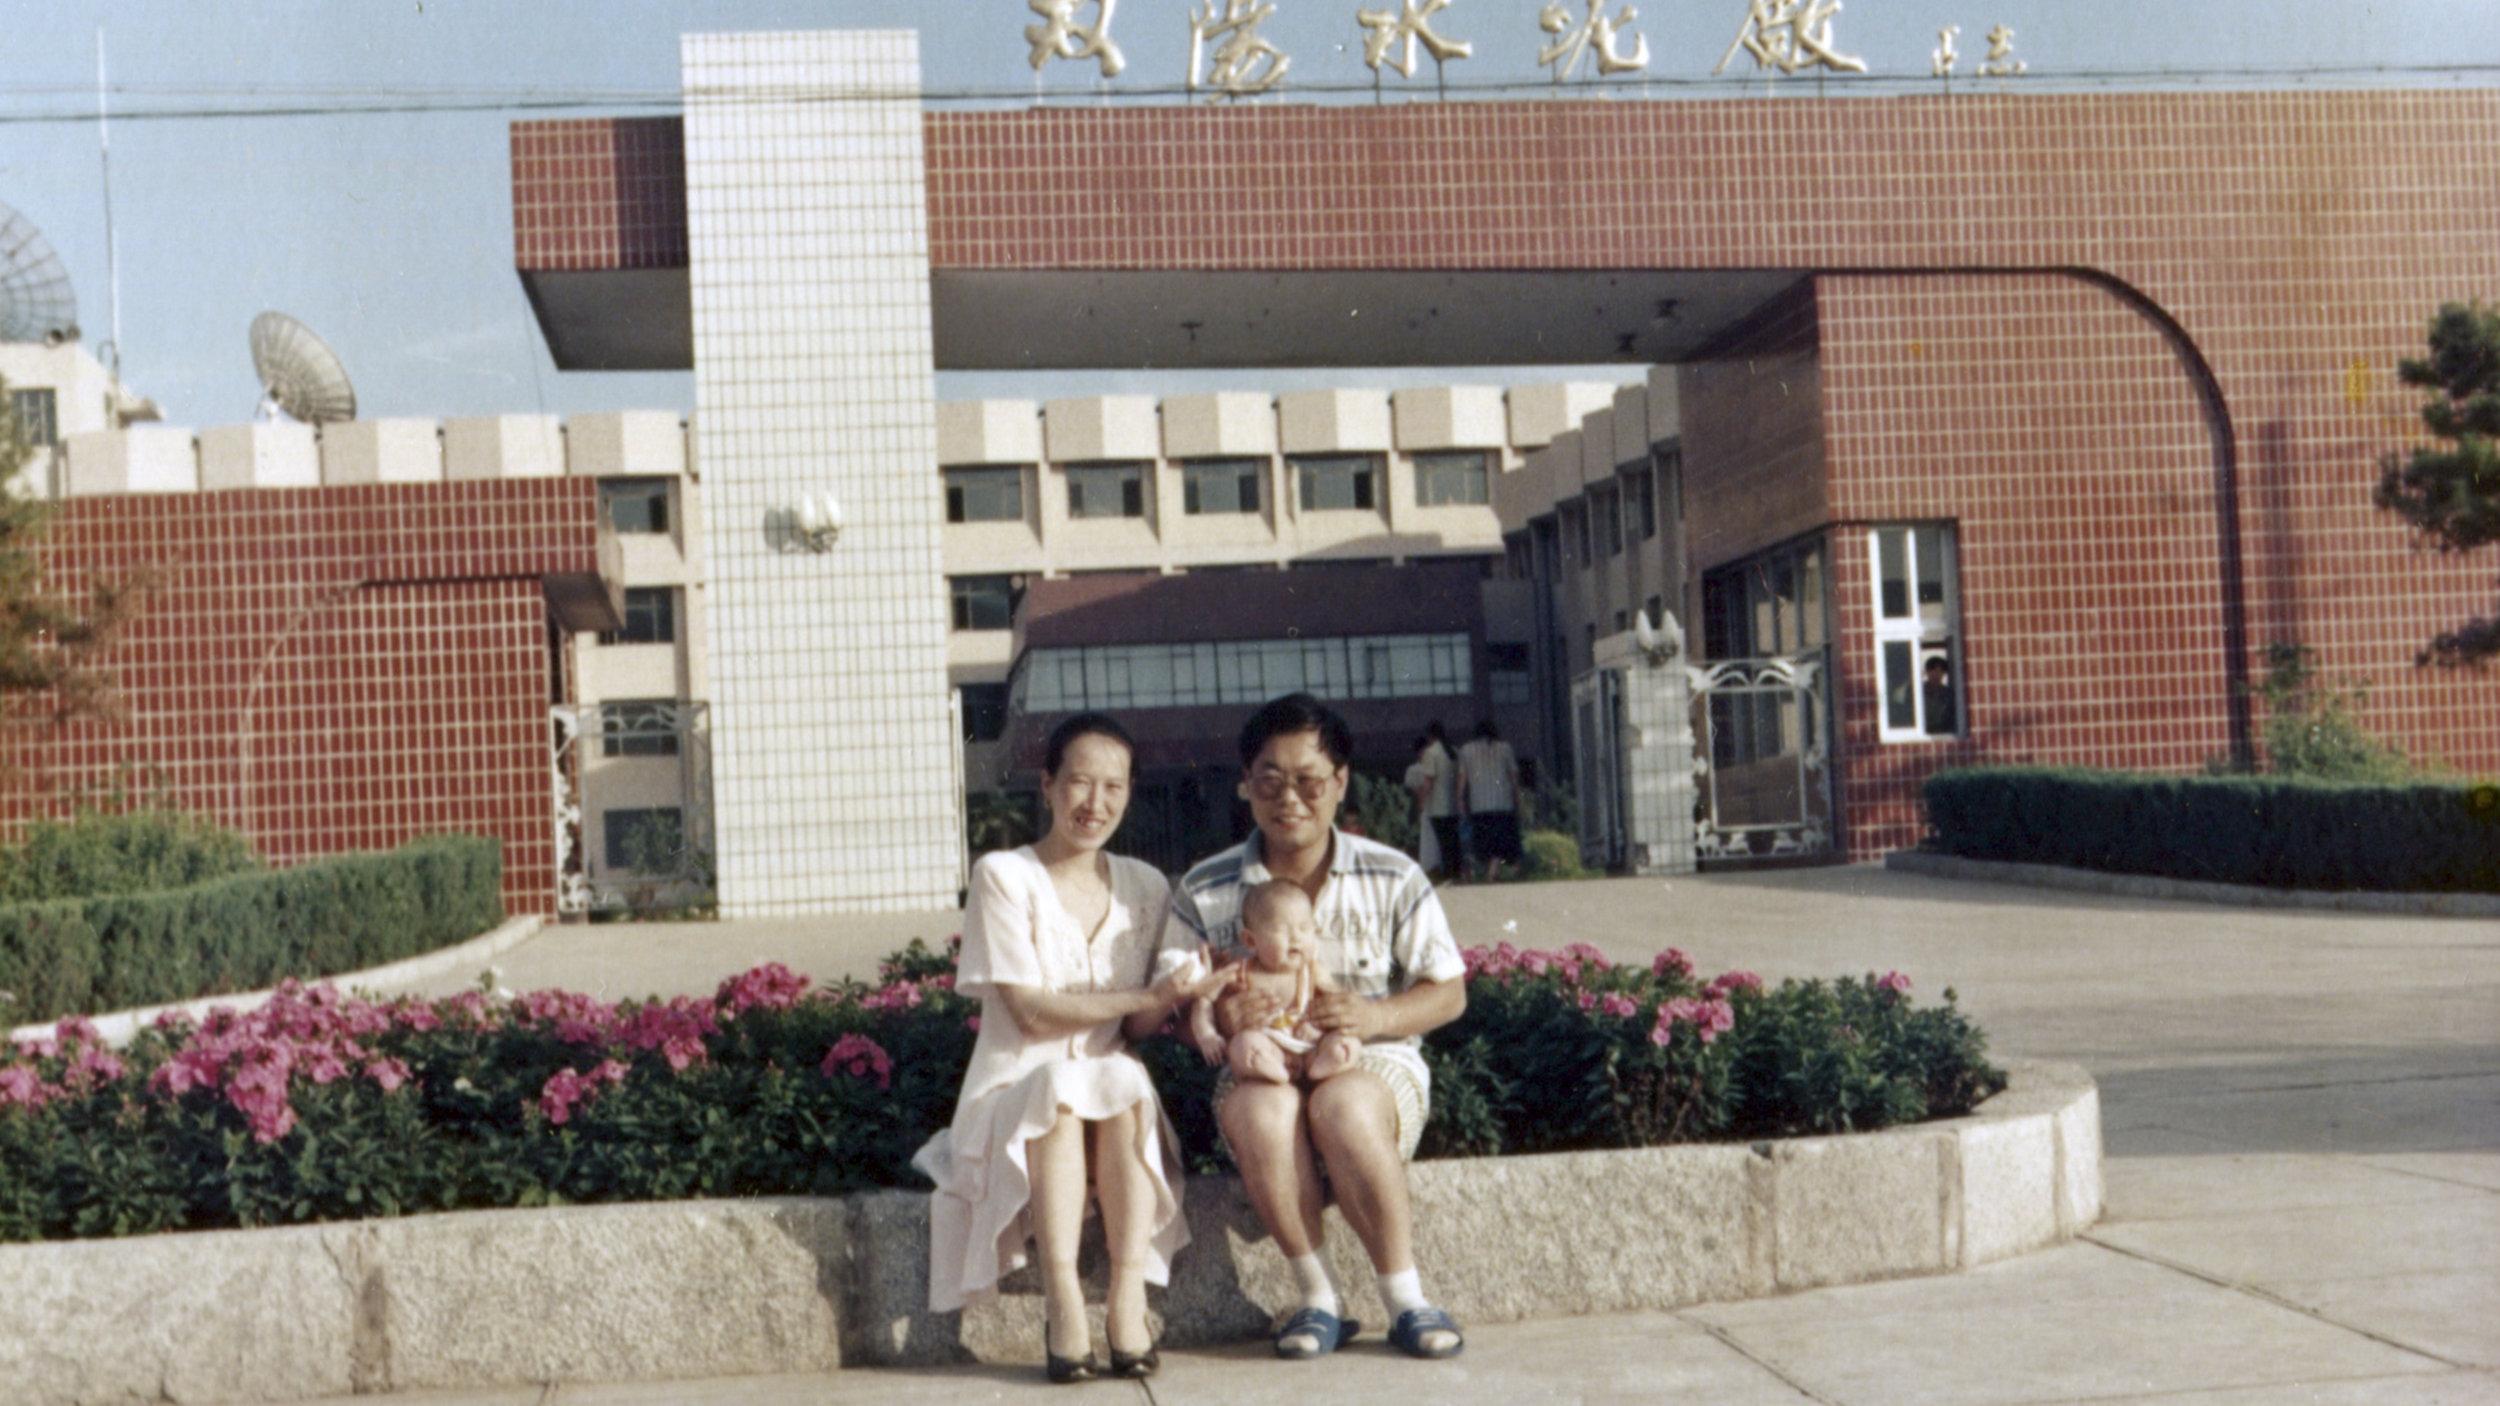 Zhang_Hanwen_2019_012.jpg